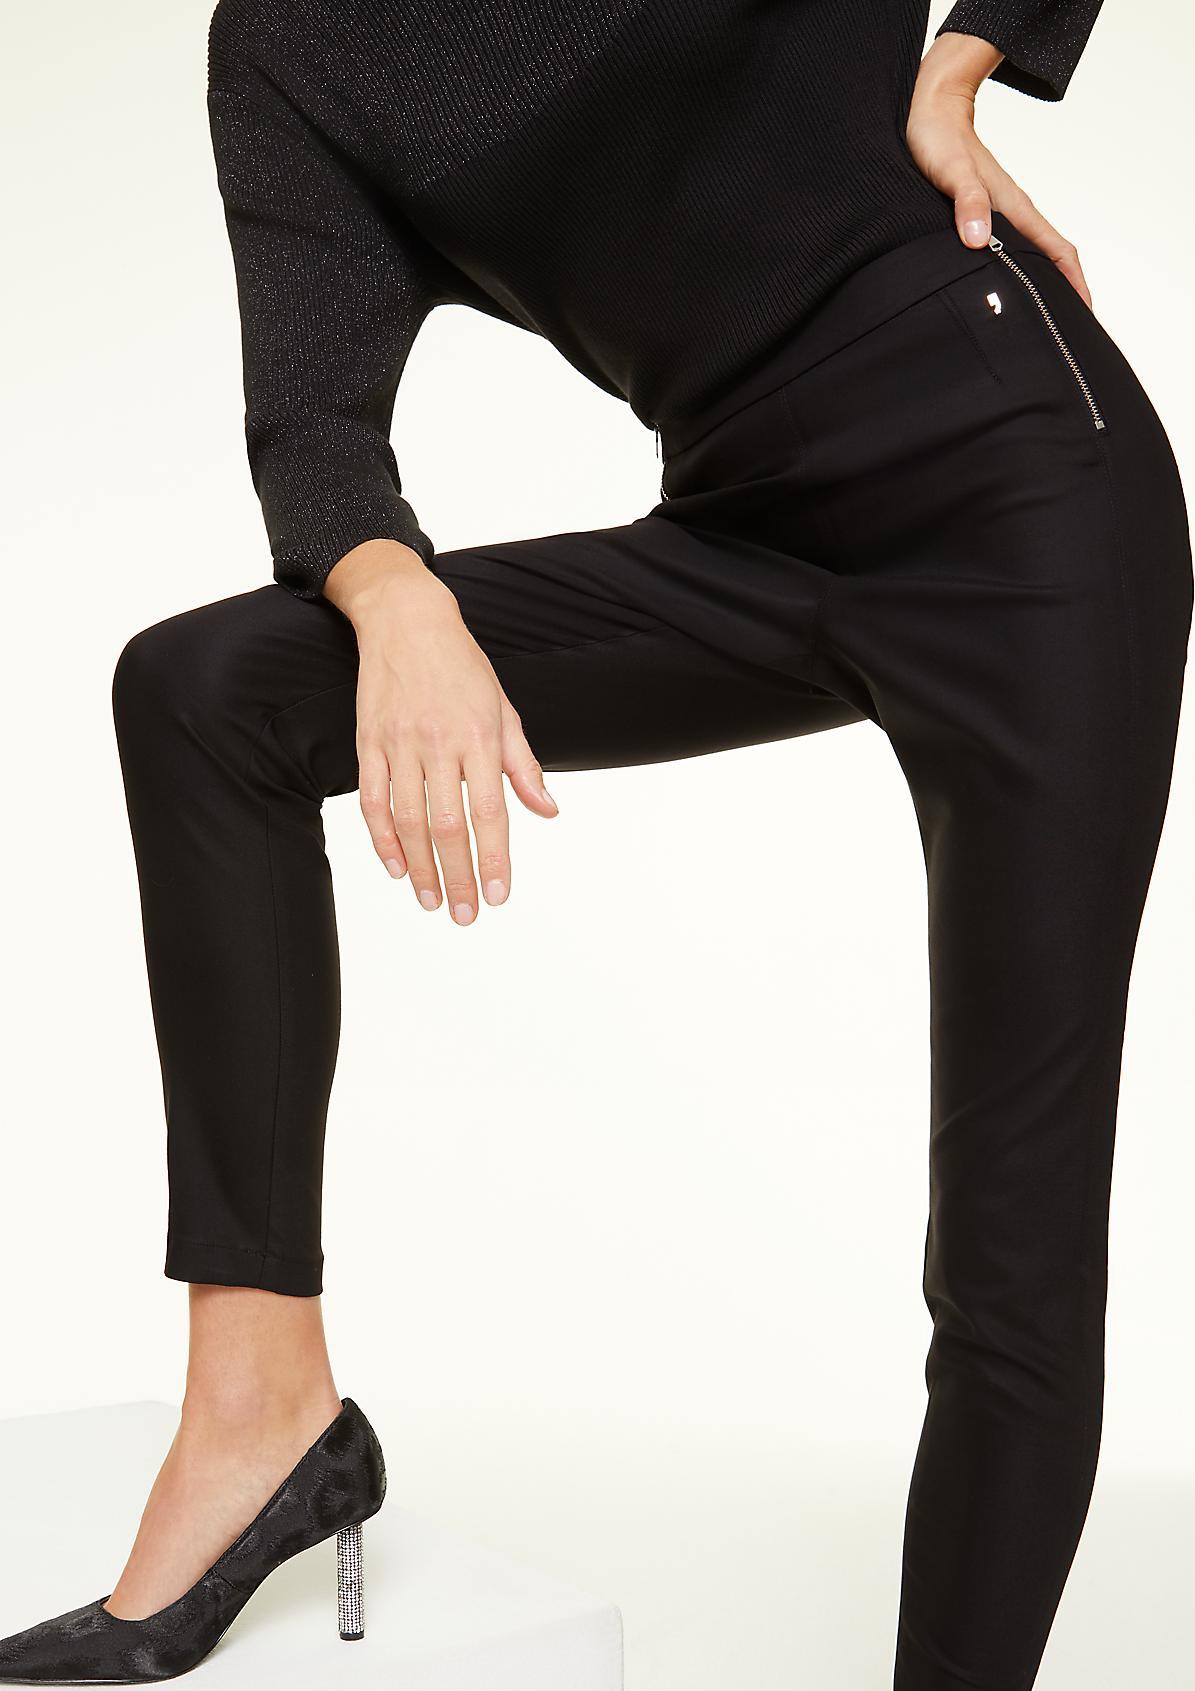 Skinny Fit: Hose mit Zipper-Details